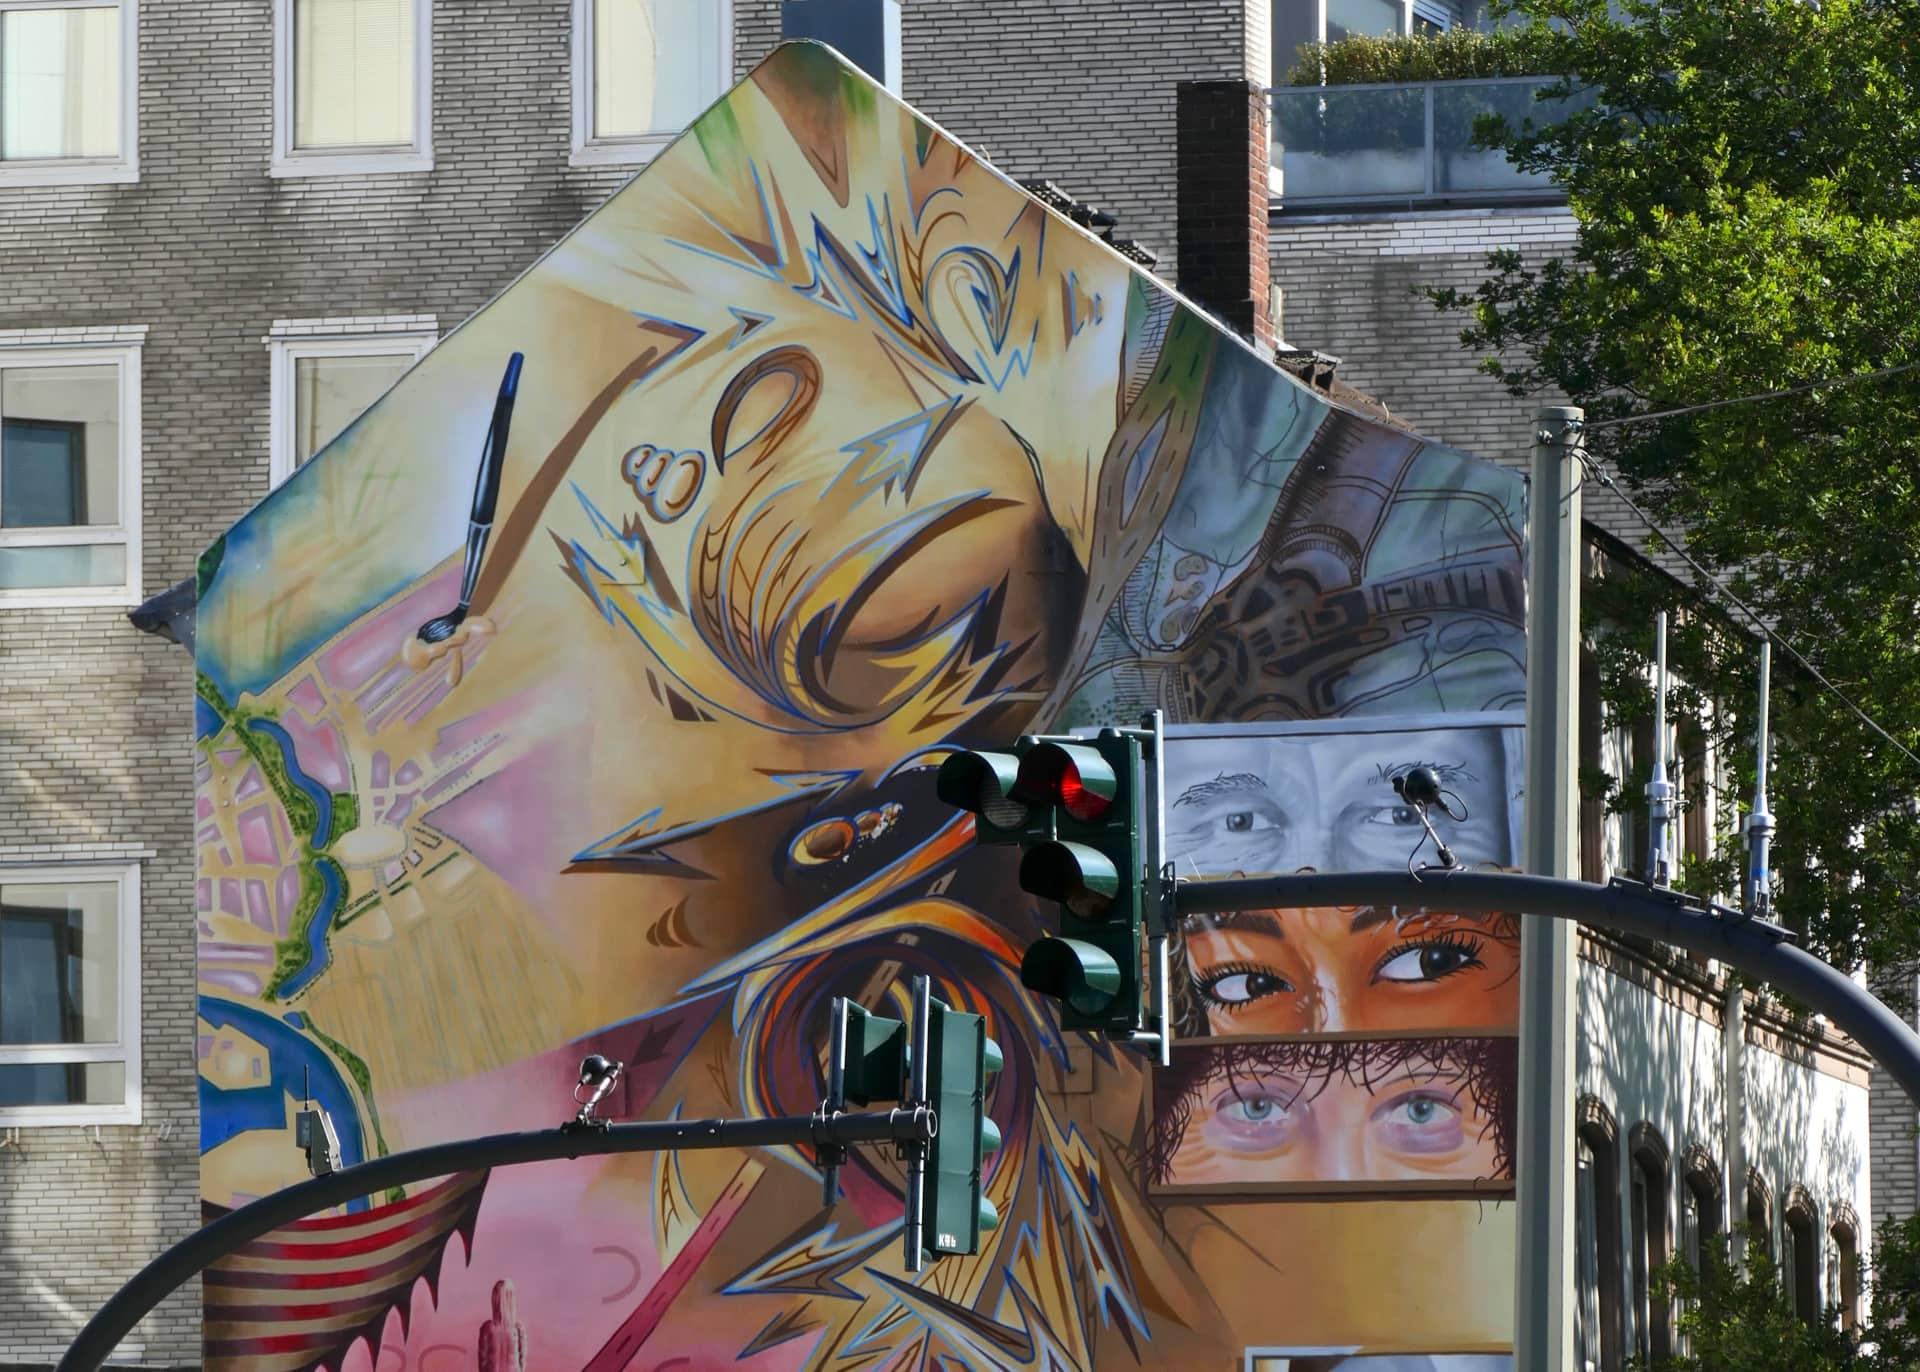 Hamburg street